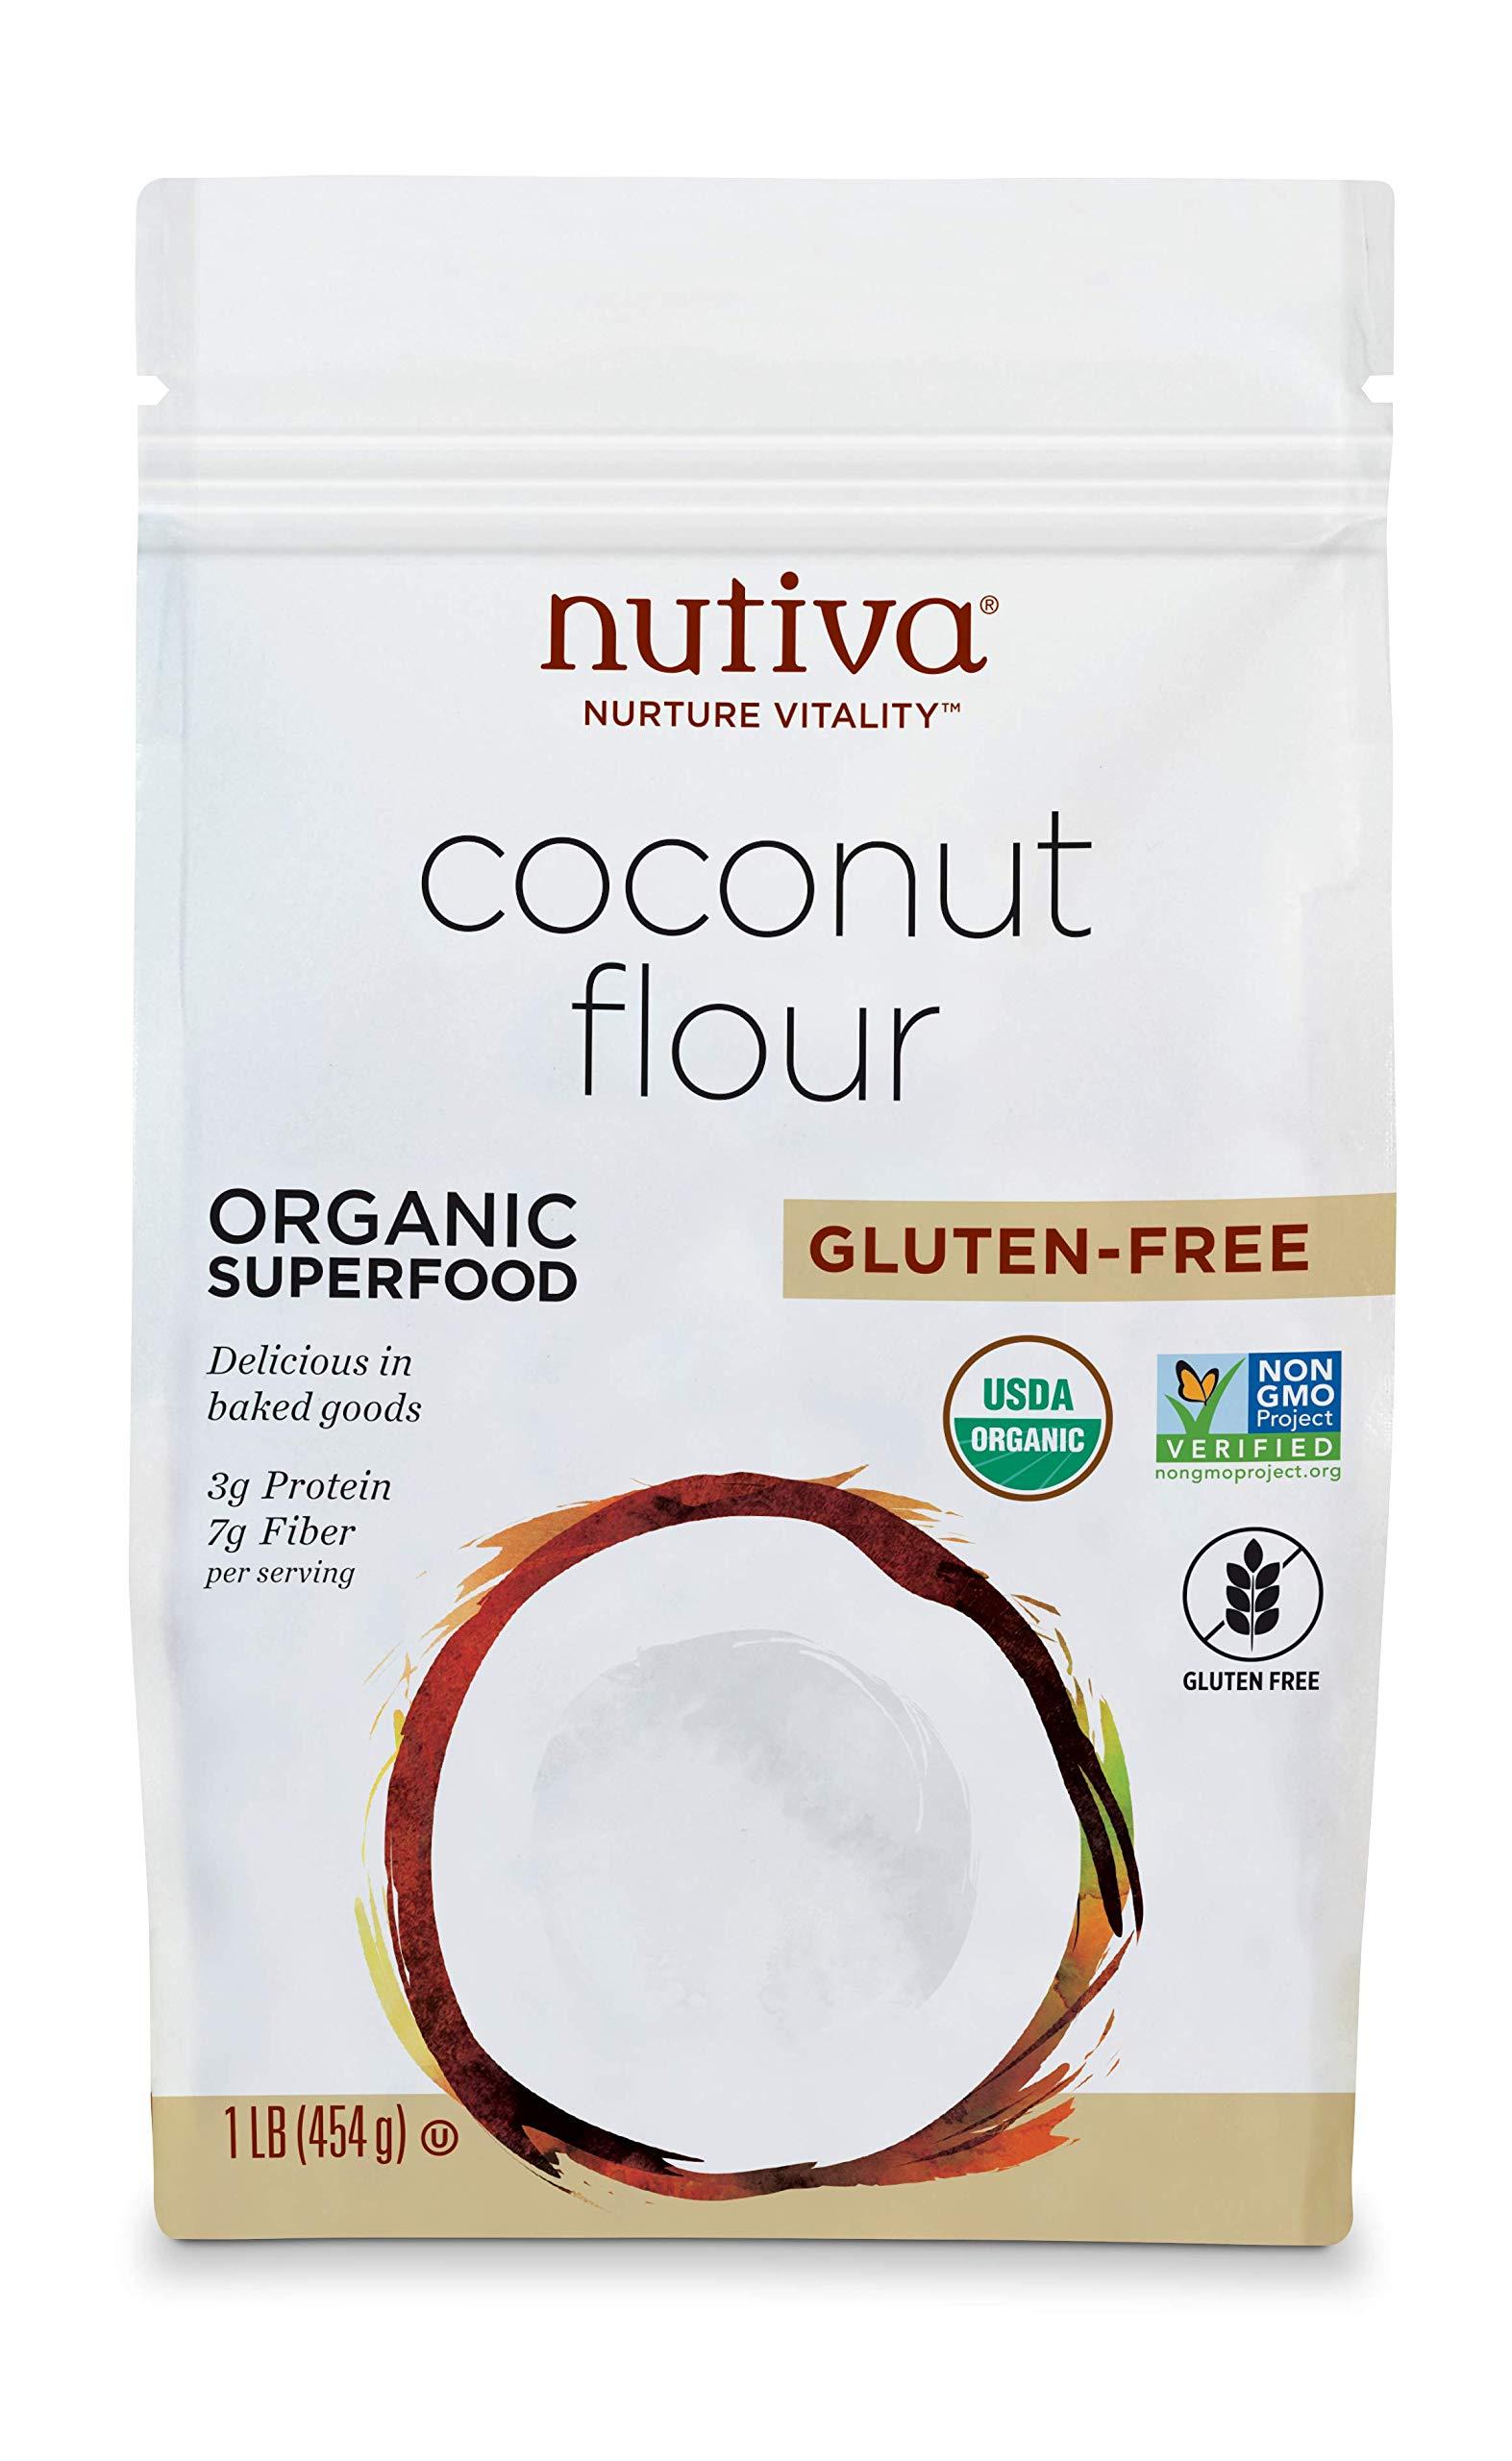 Nutiva USDA Certified Organic, non-GMO, Gluten-free Coconut Flour, 16-ounce (Pack of 6) by Nutiva (Image #4)